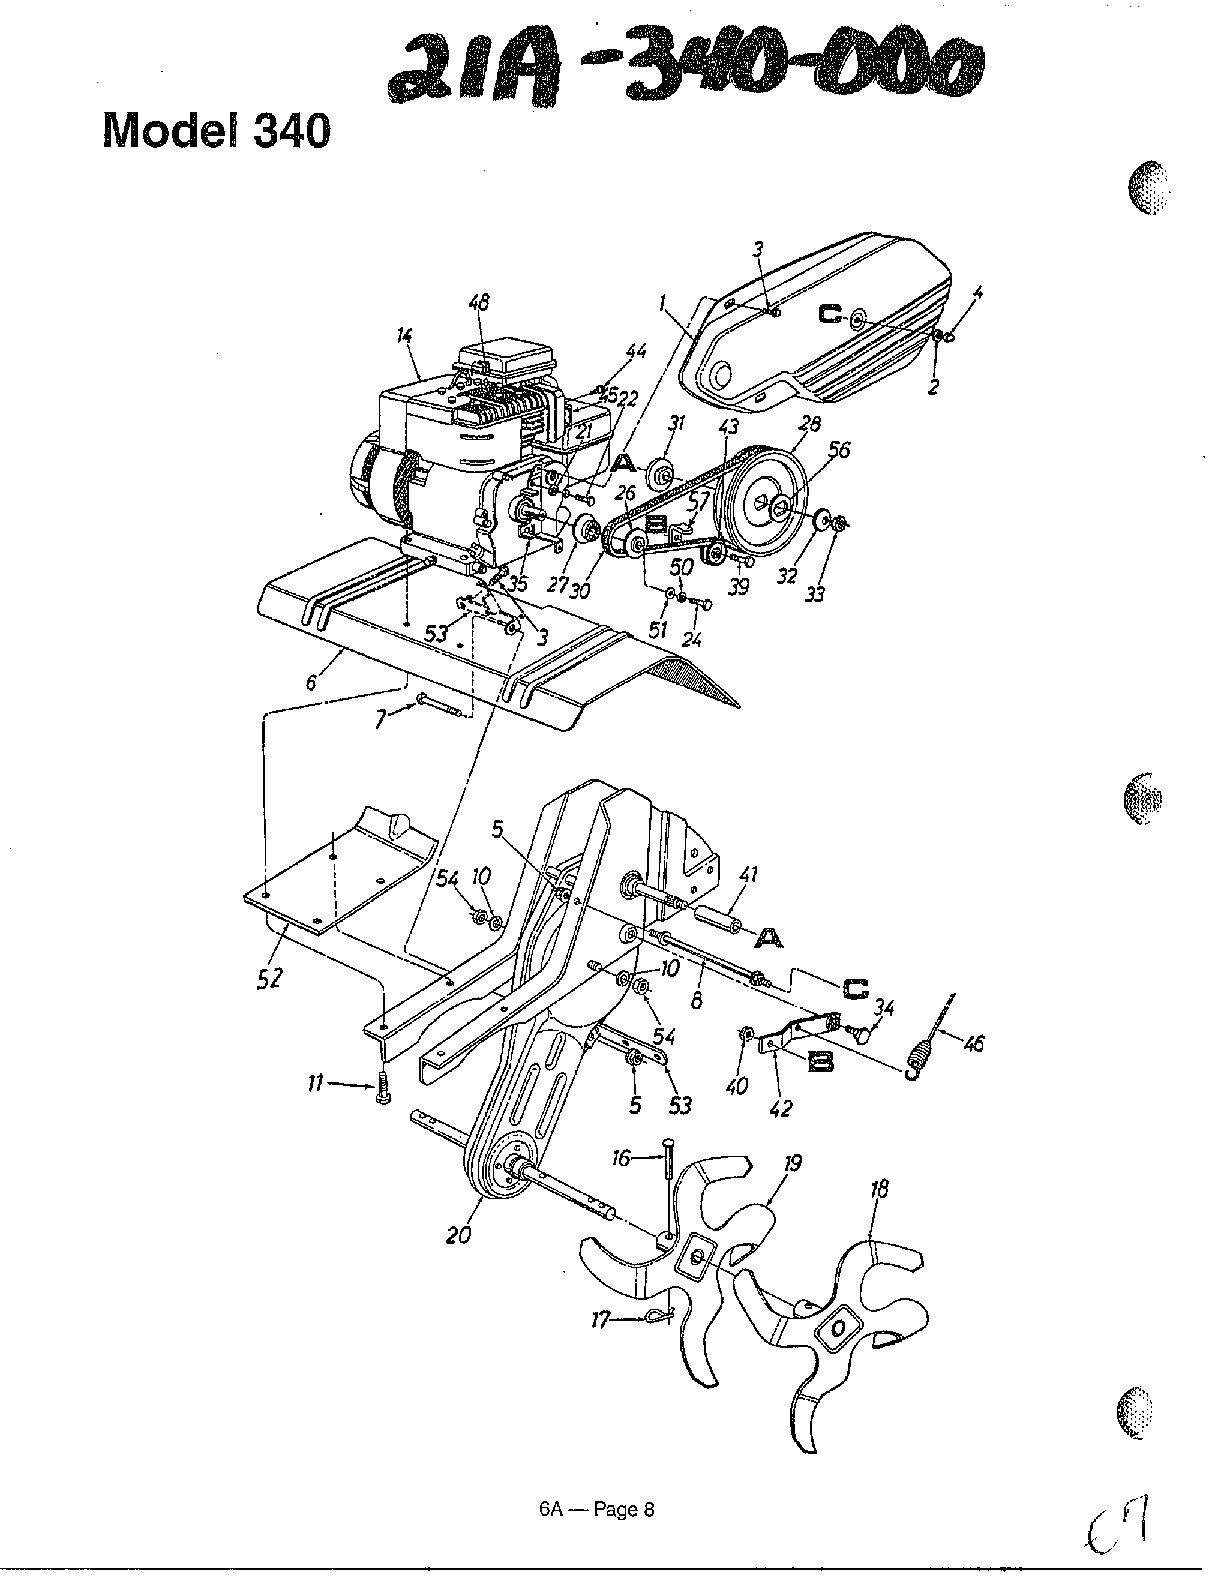 Mtd model 21A-035-000 rear tine, gas tiller genuine parts